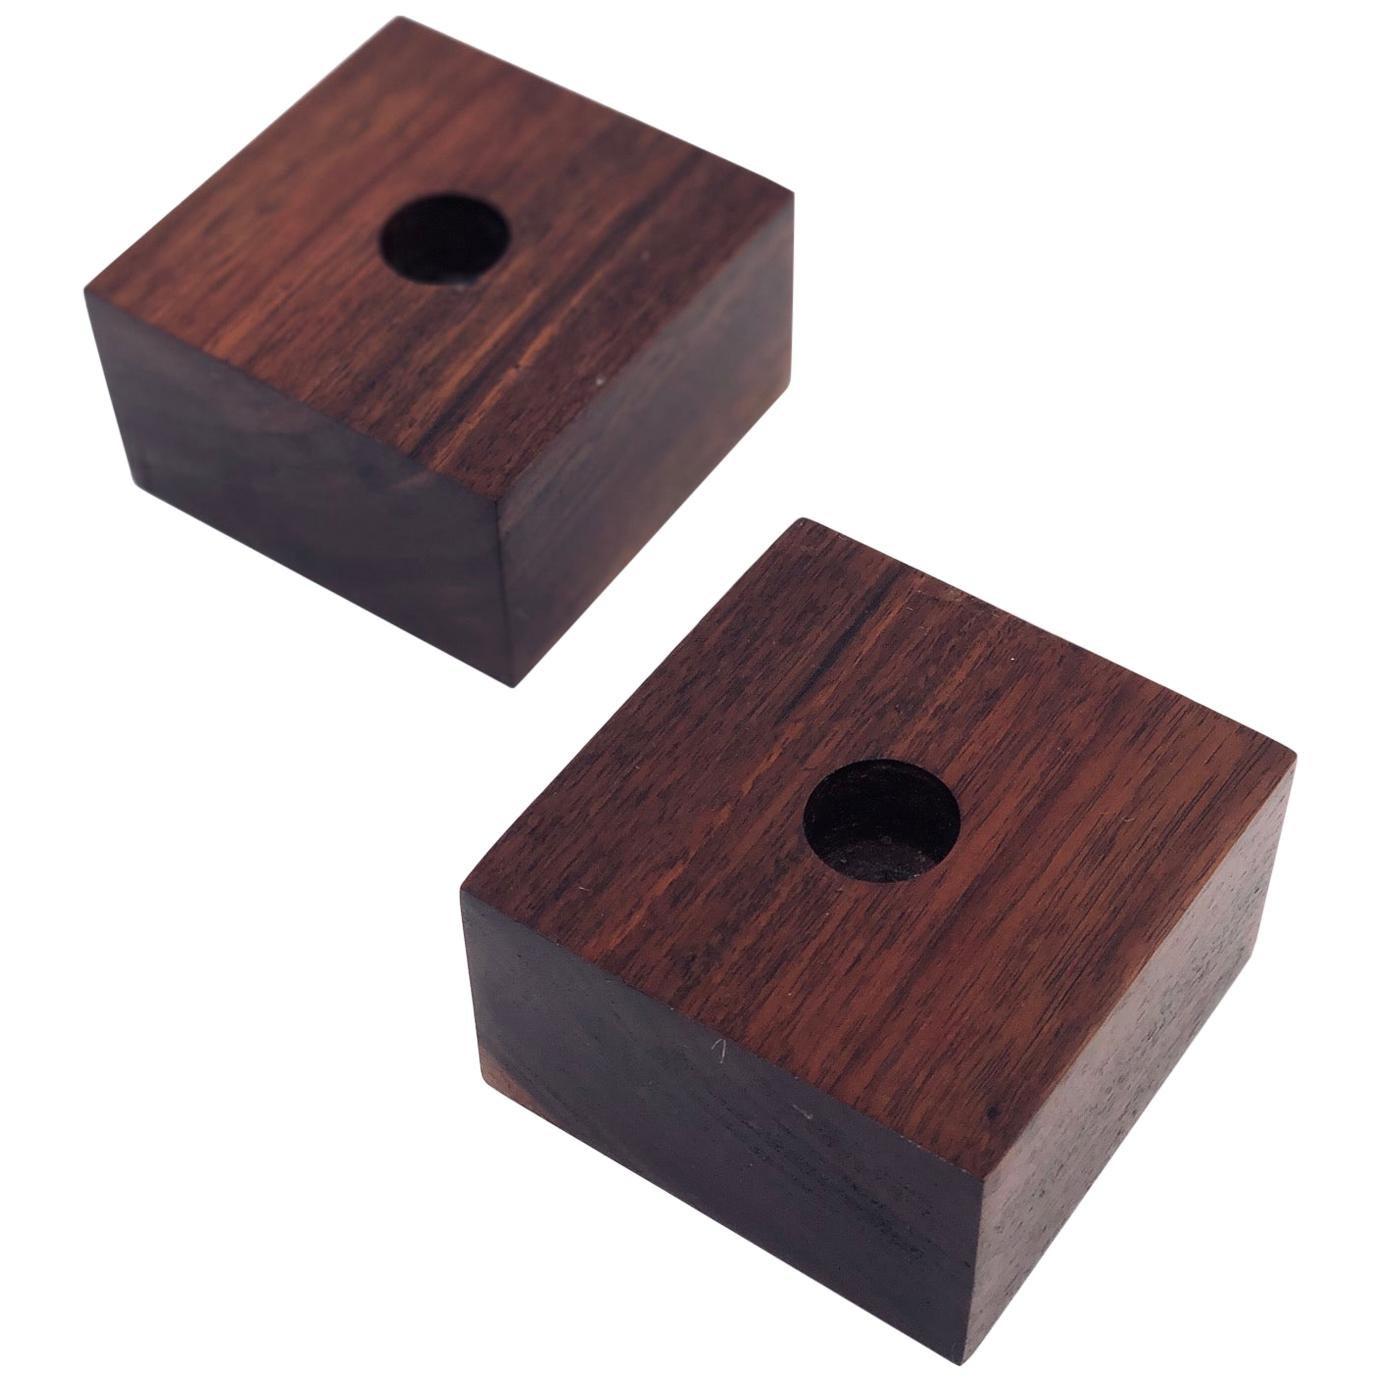 Modernist Danish Modern Solid Walnut Pair of Candleholders